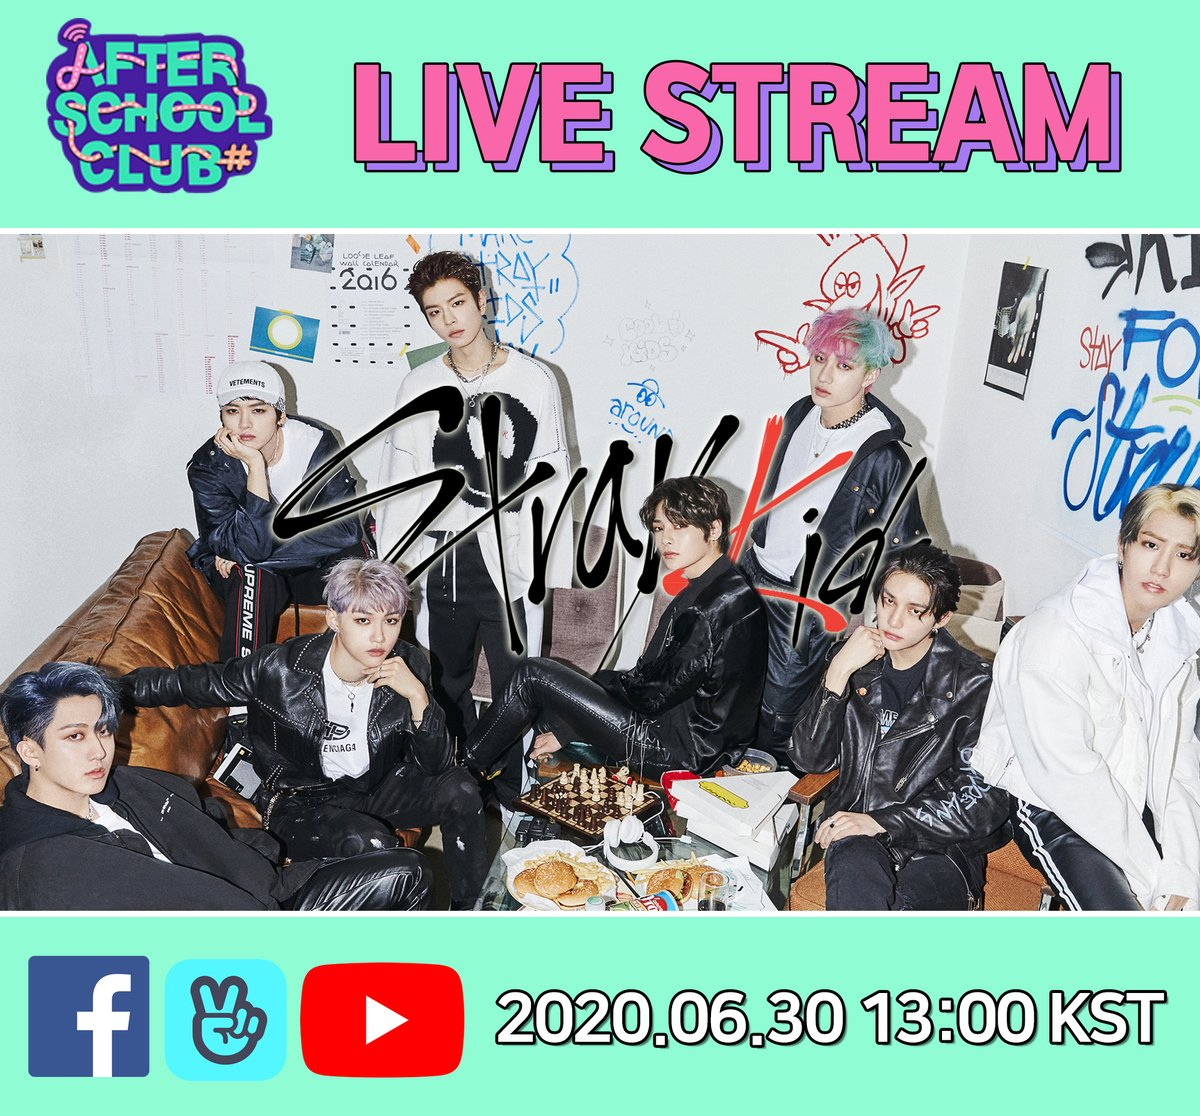 Live Stream: https://www.youtube.com/watch?v=xHdzorzBCDA… http://www.arirang.com/event/pr/Newmedia_Platforms.asp… You can also stream it live through V app, Facebook & Twitter!pic.twitter.com/iIIOvurHdL  by After School Club